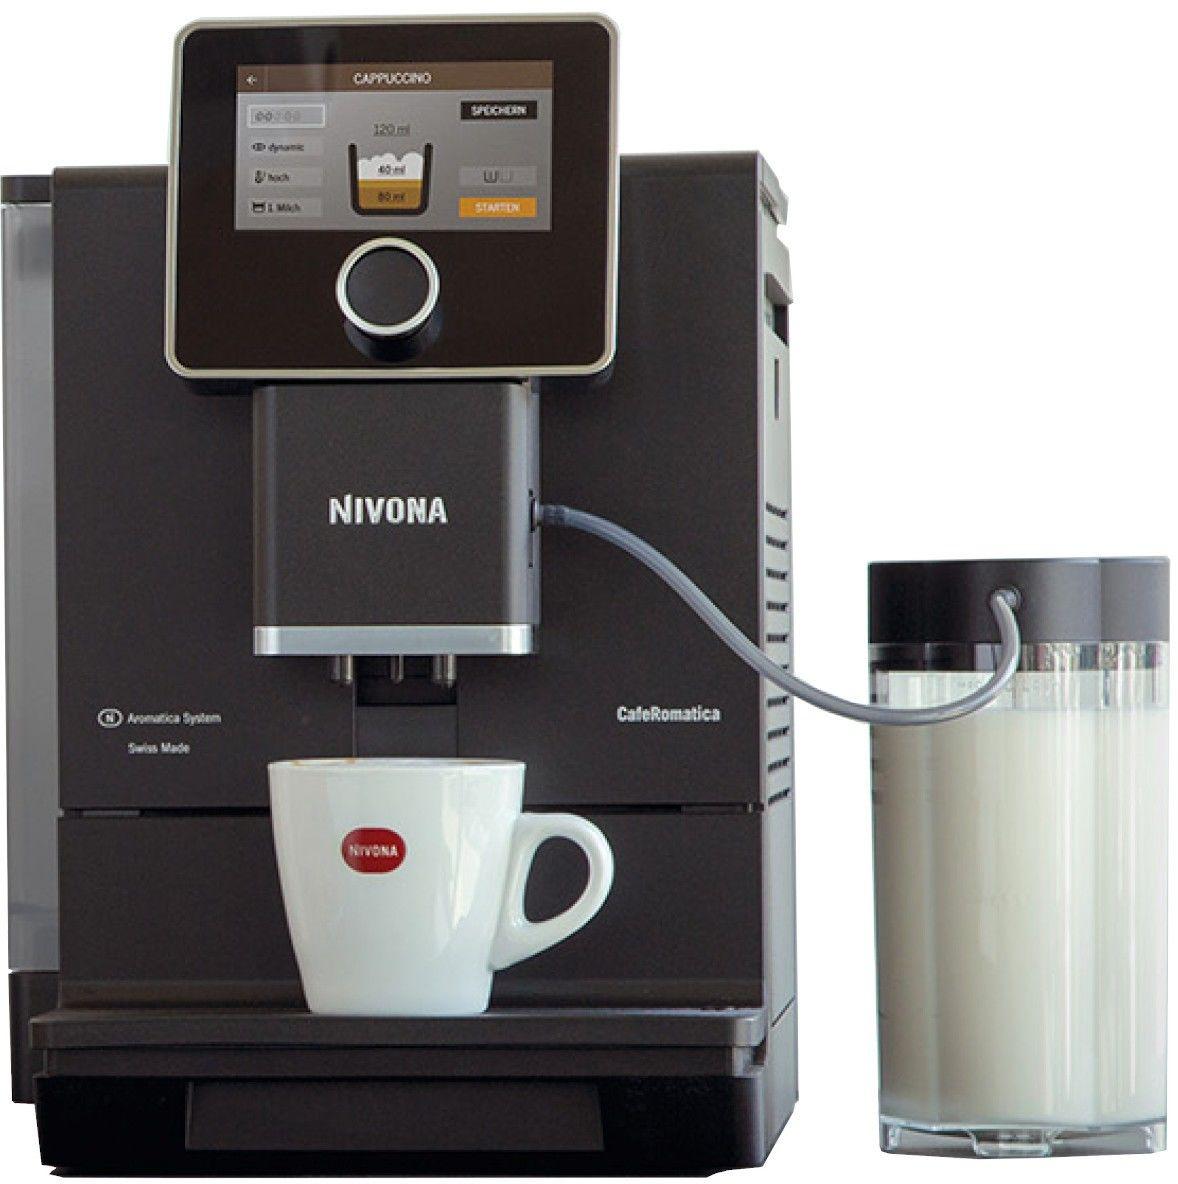 Ekspres Nivona 960 CafeRomatica